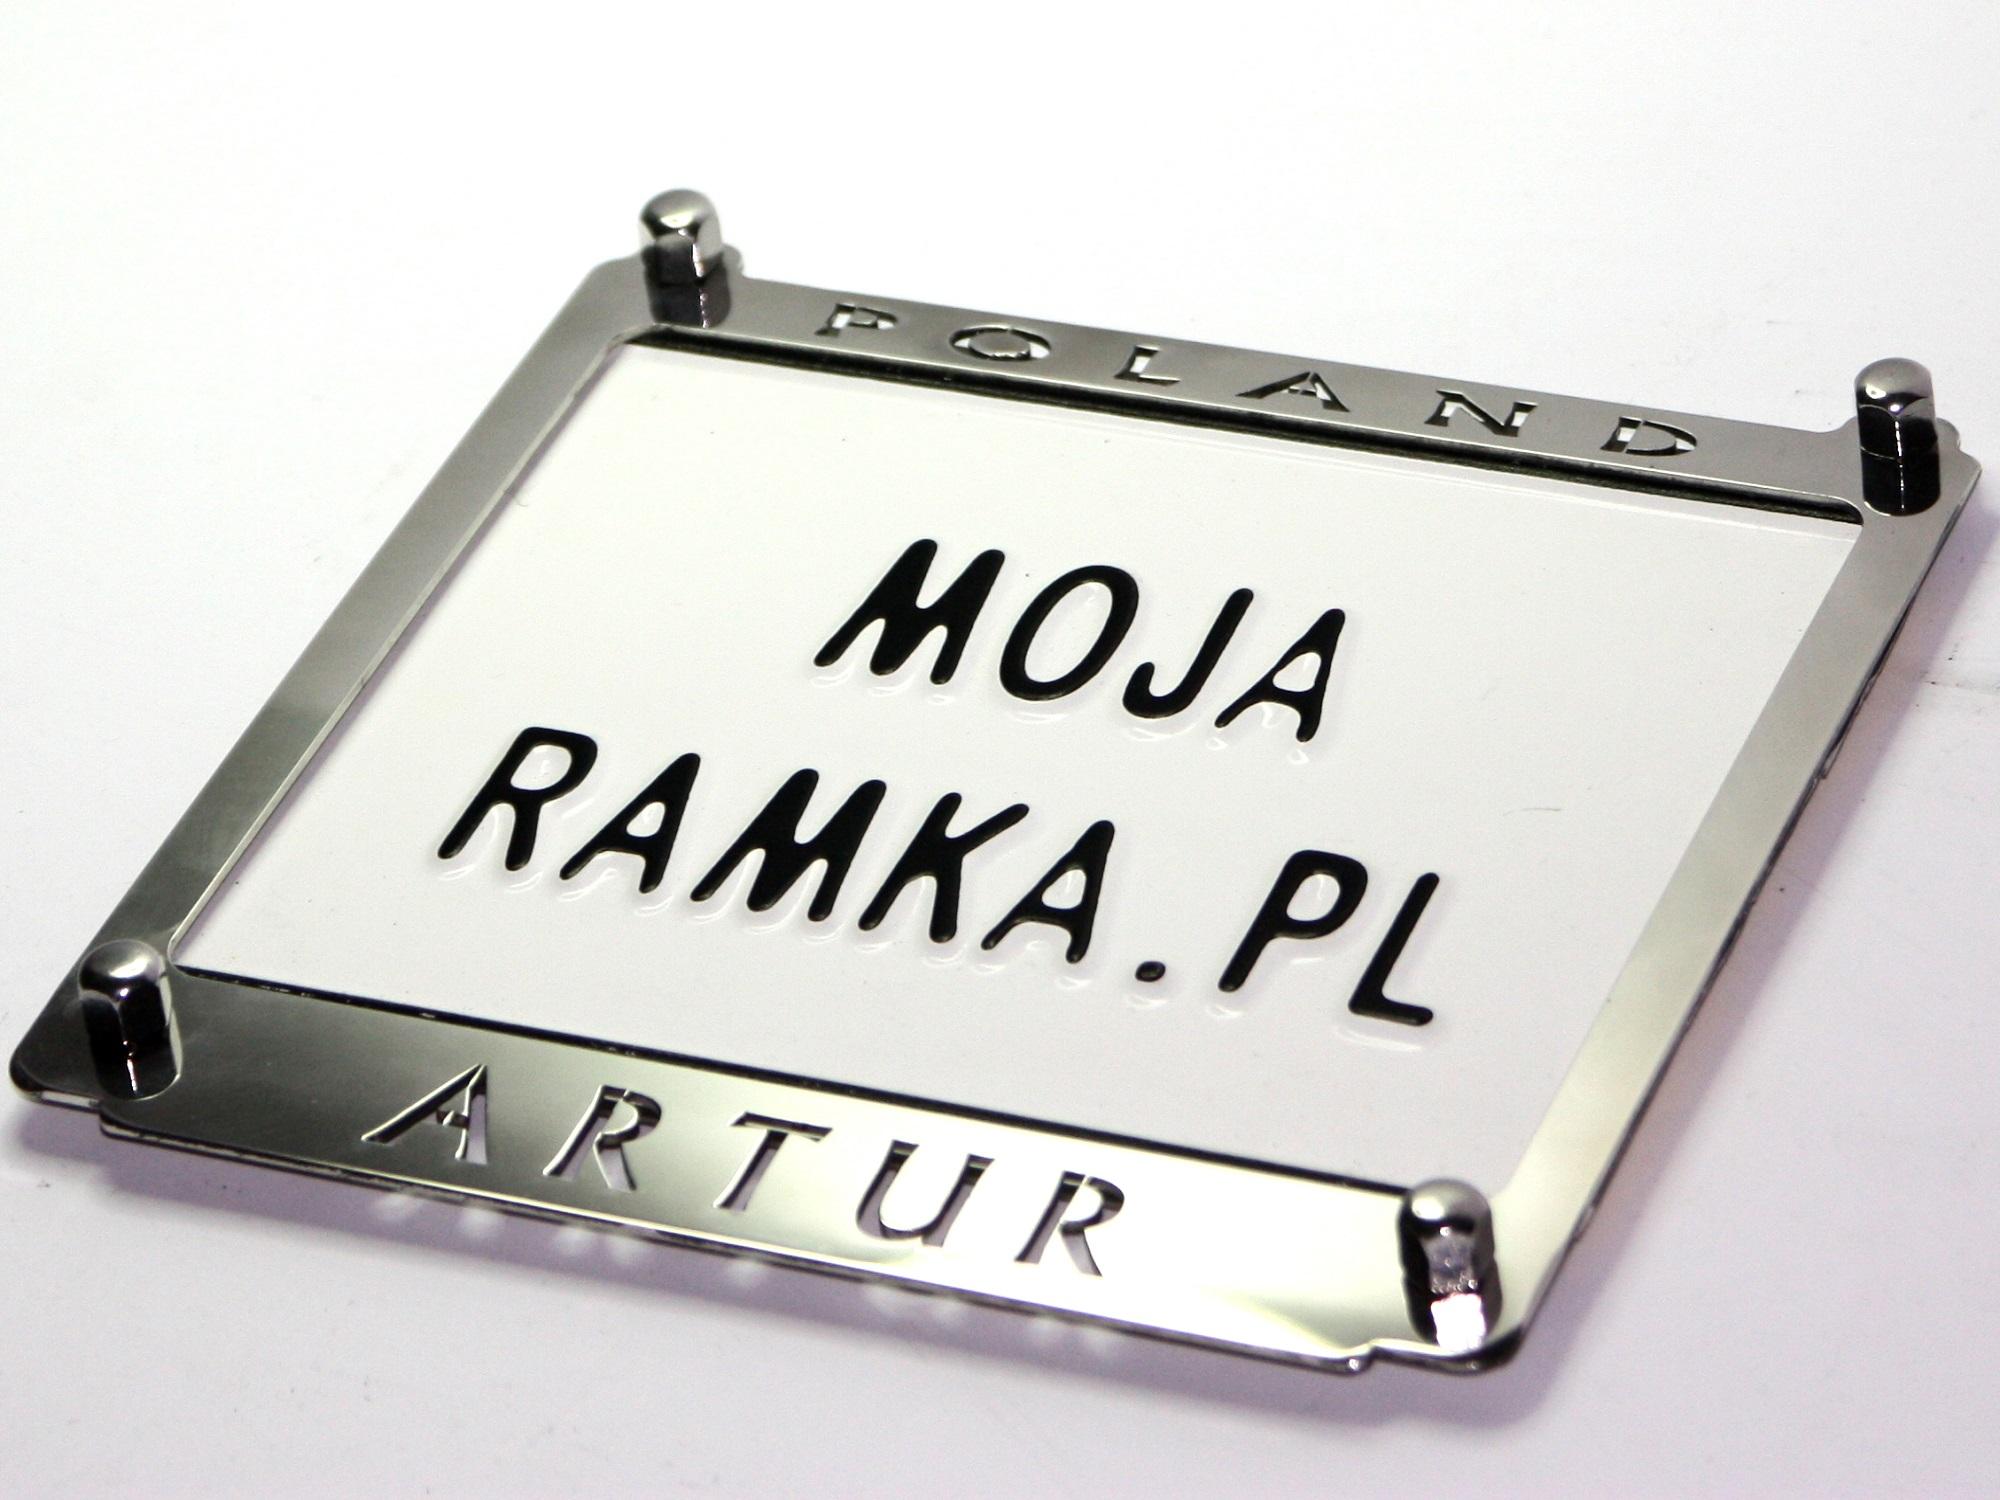 Рамка номерного знака мотоцикла ВАША НАДПИСЬ!